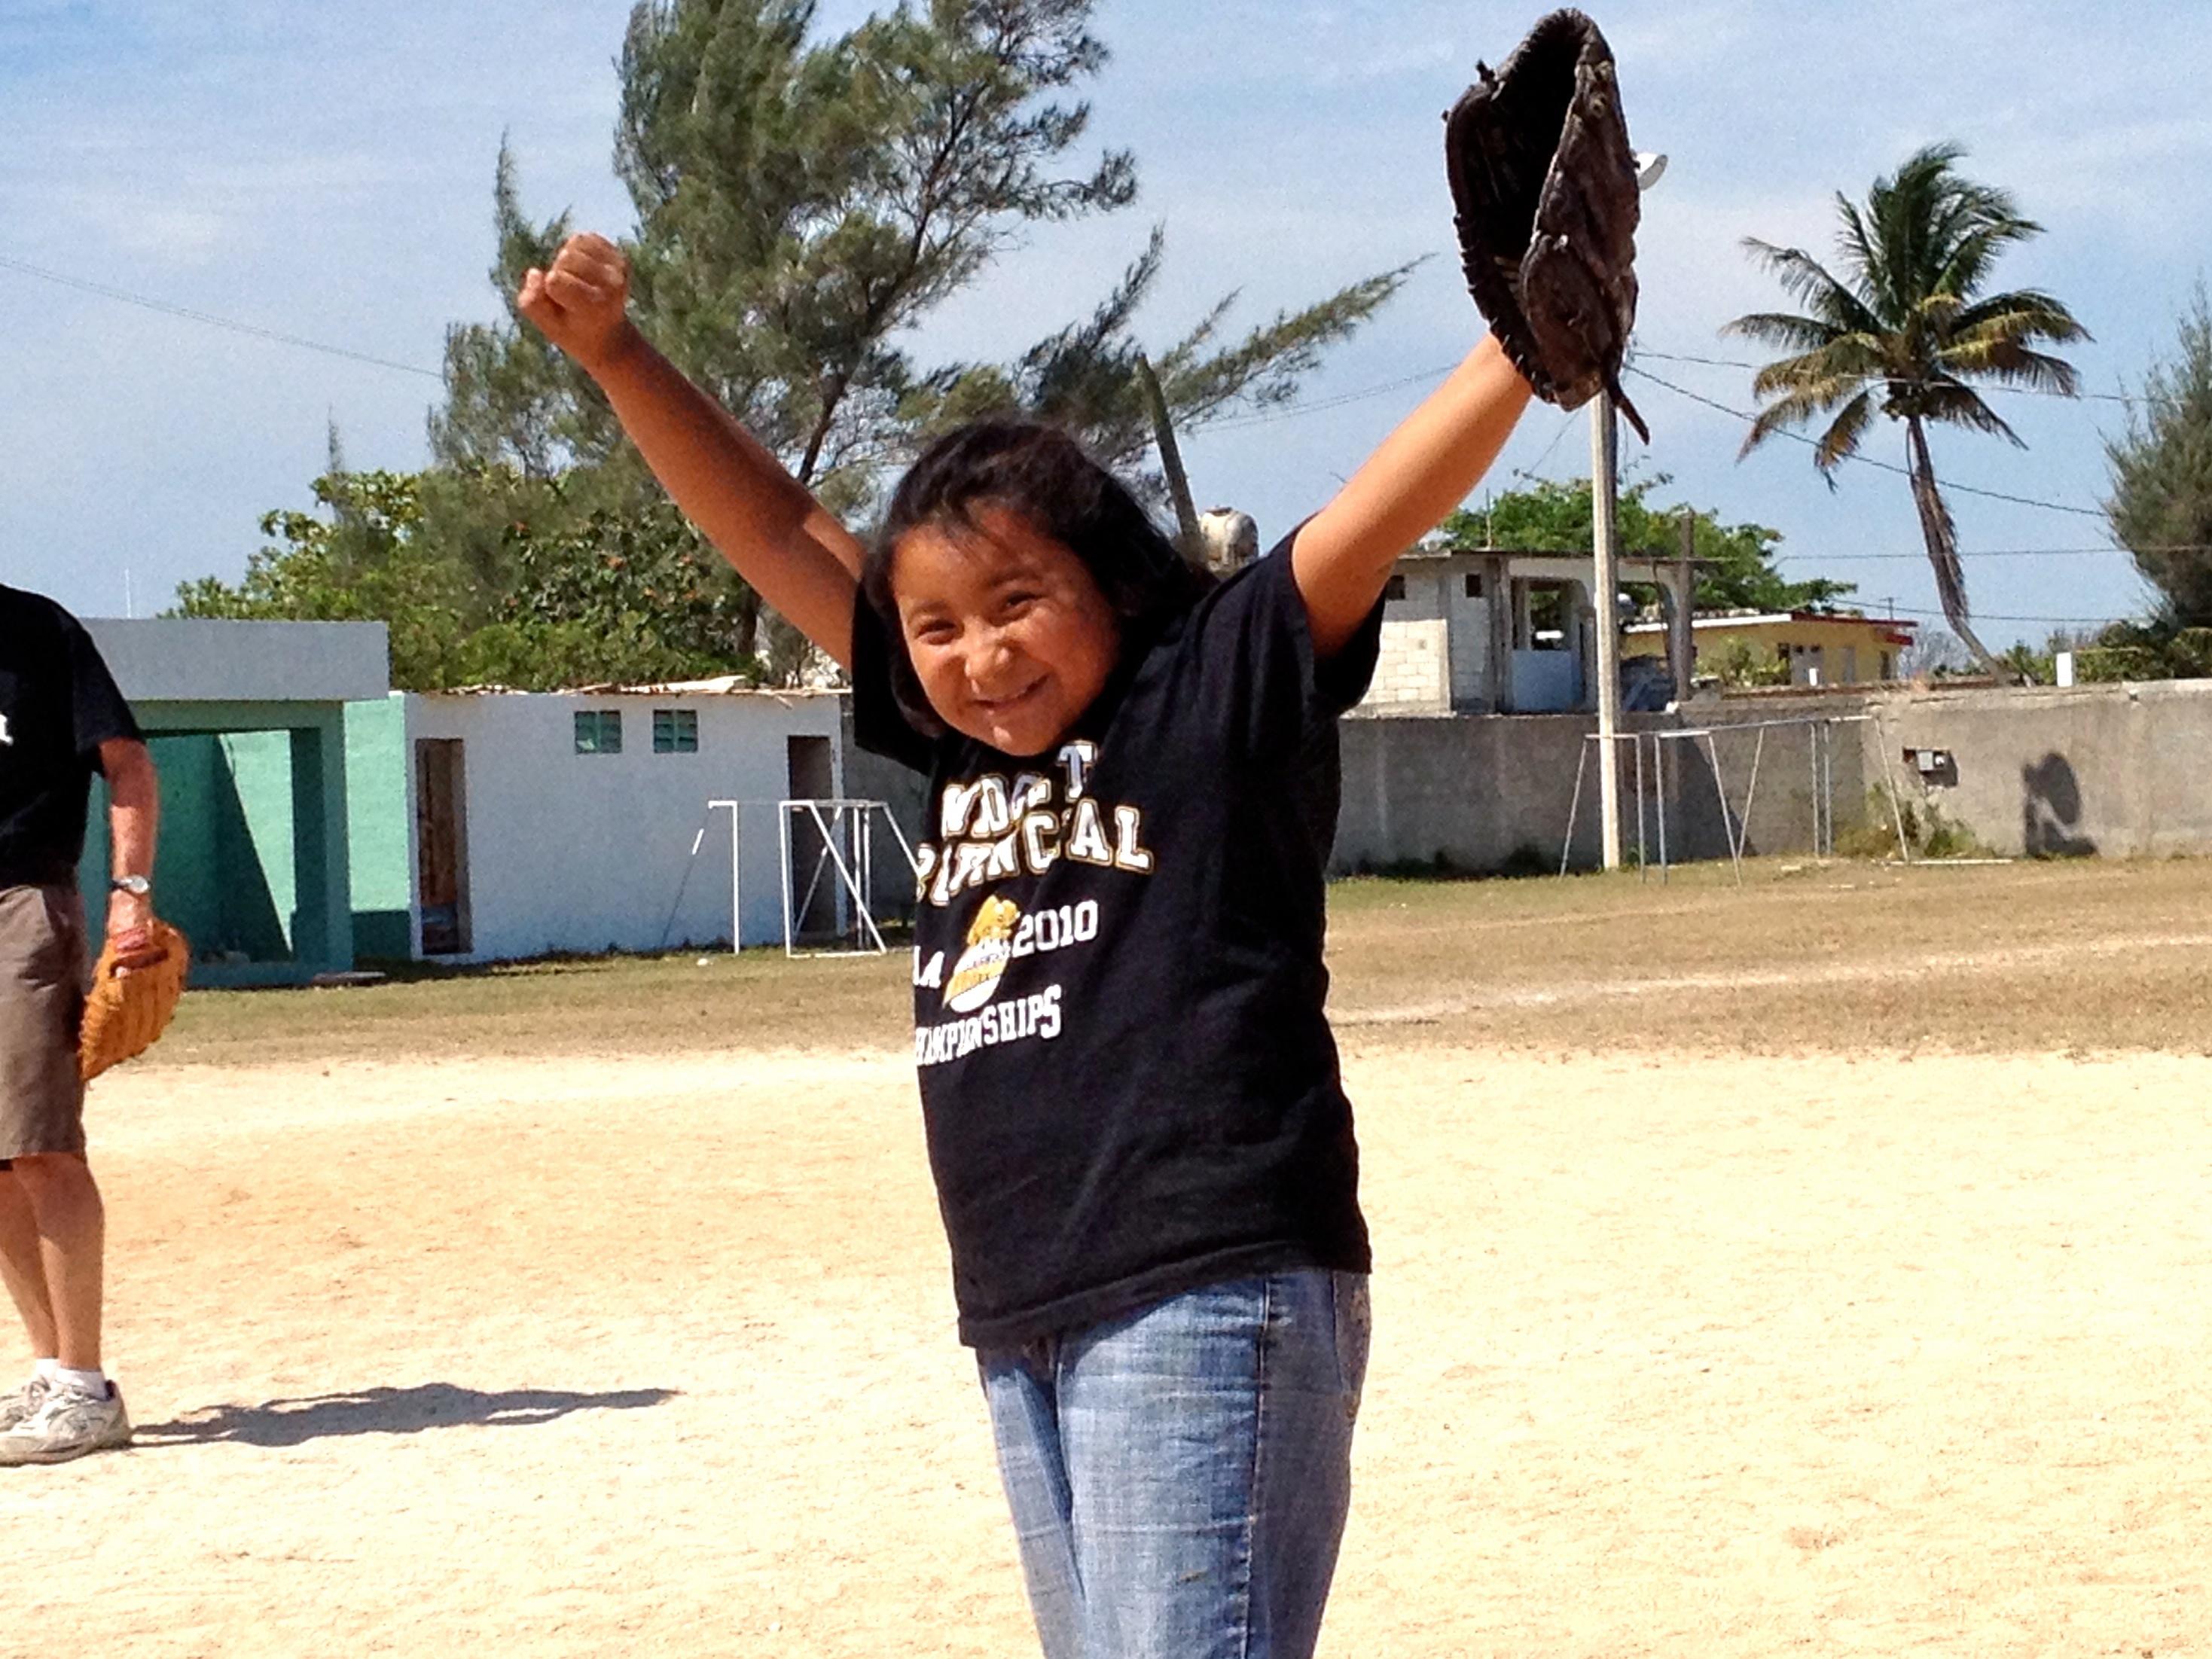 Programs – Sport Camp for Kids